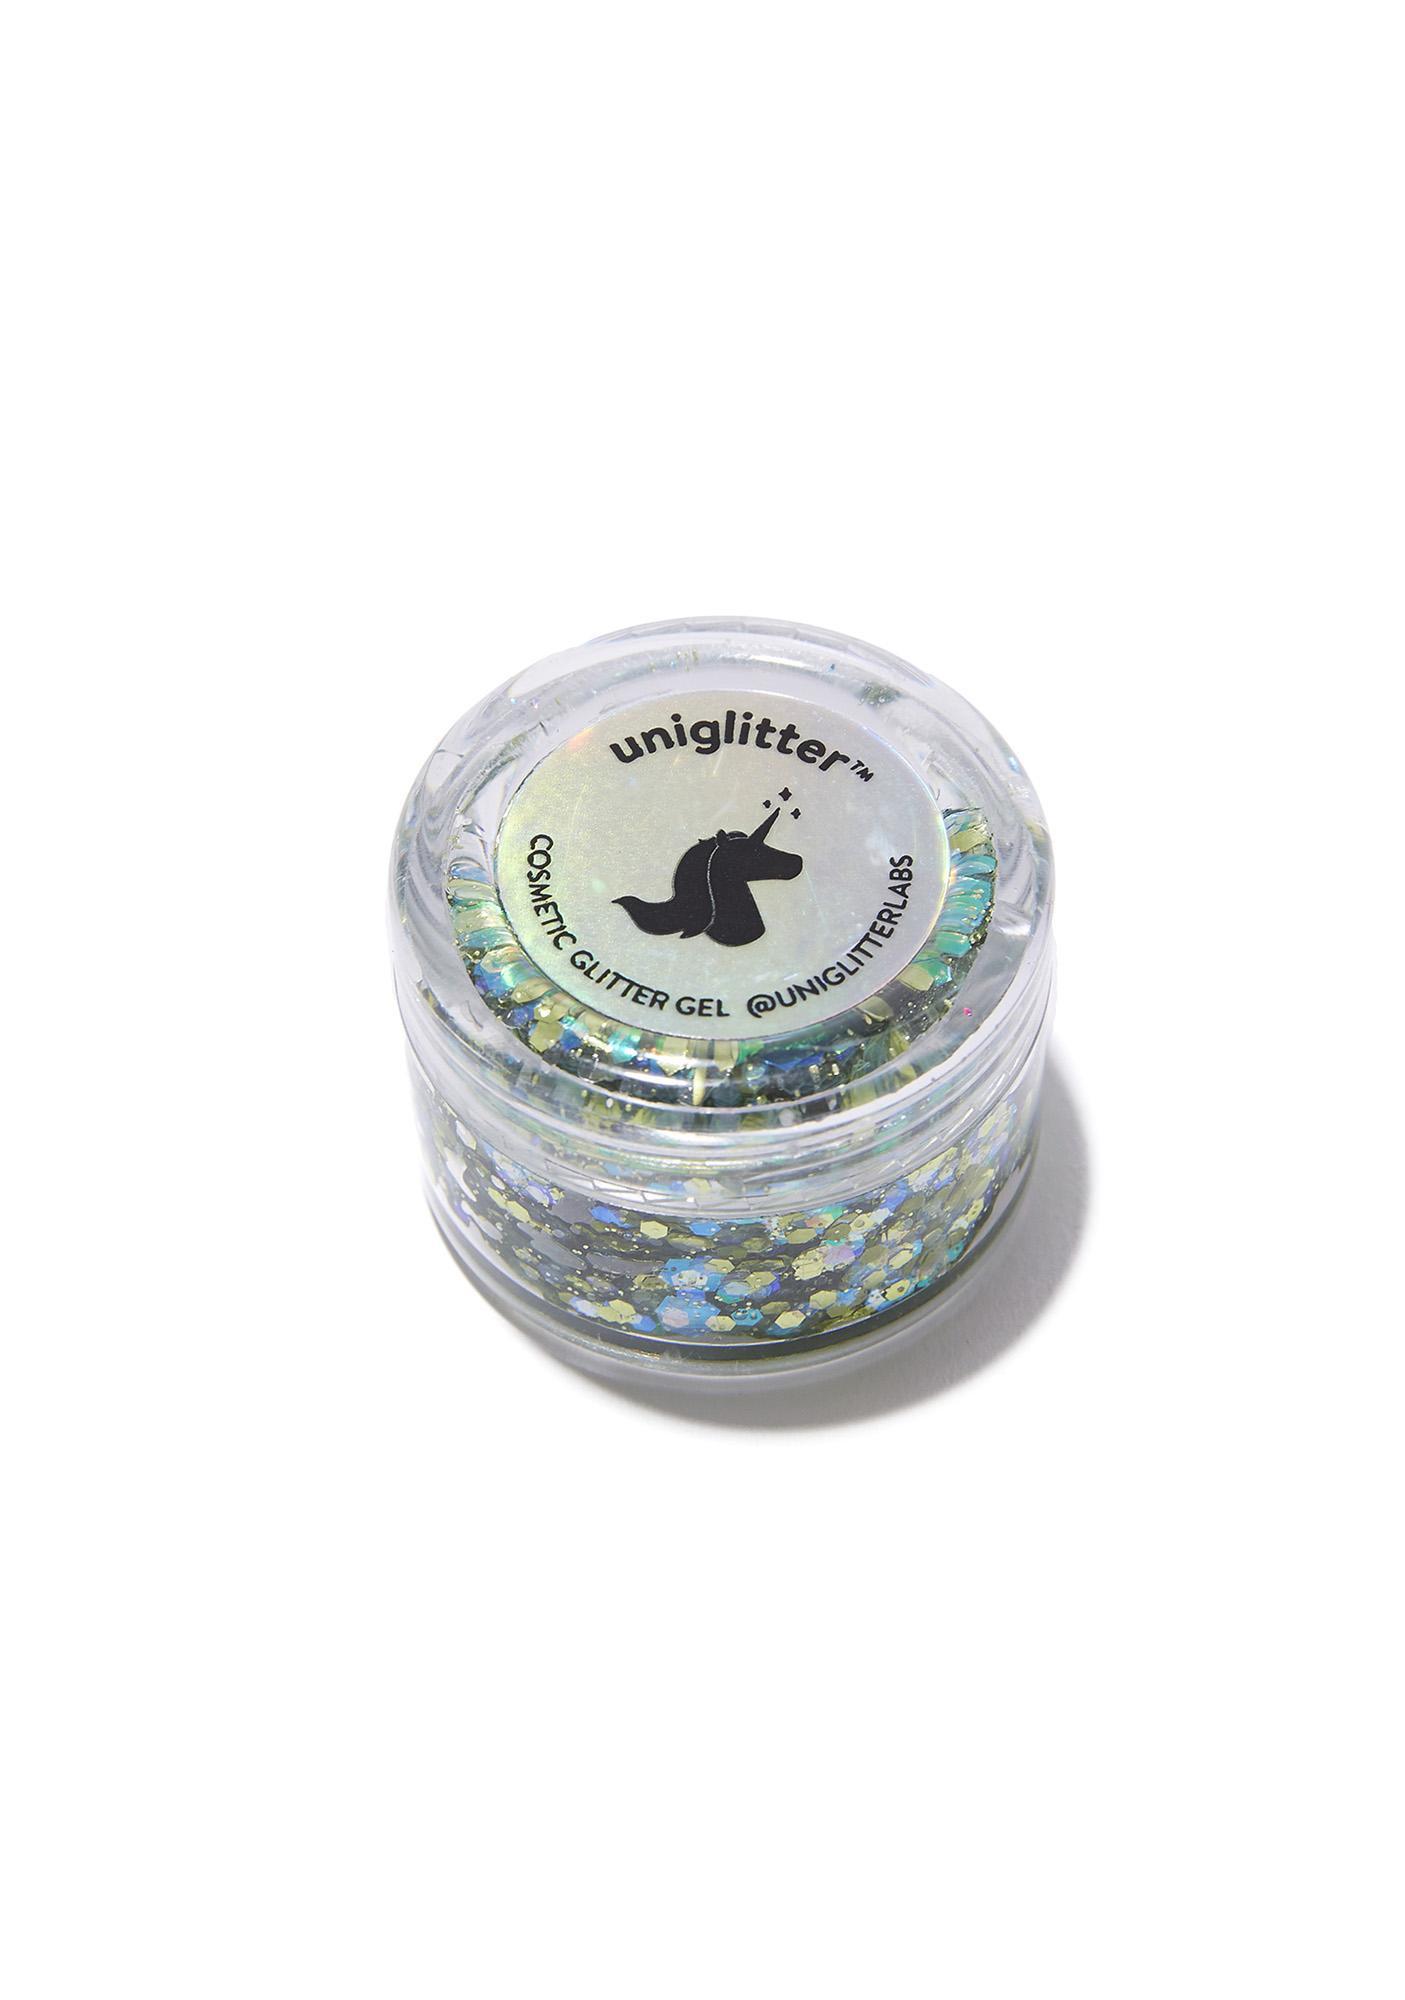 Uniglitter Seahorse Green Glitter Gel